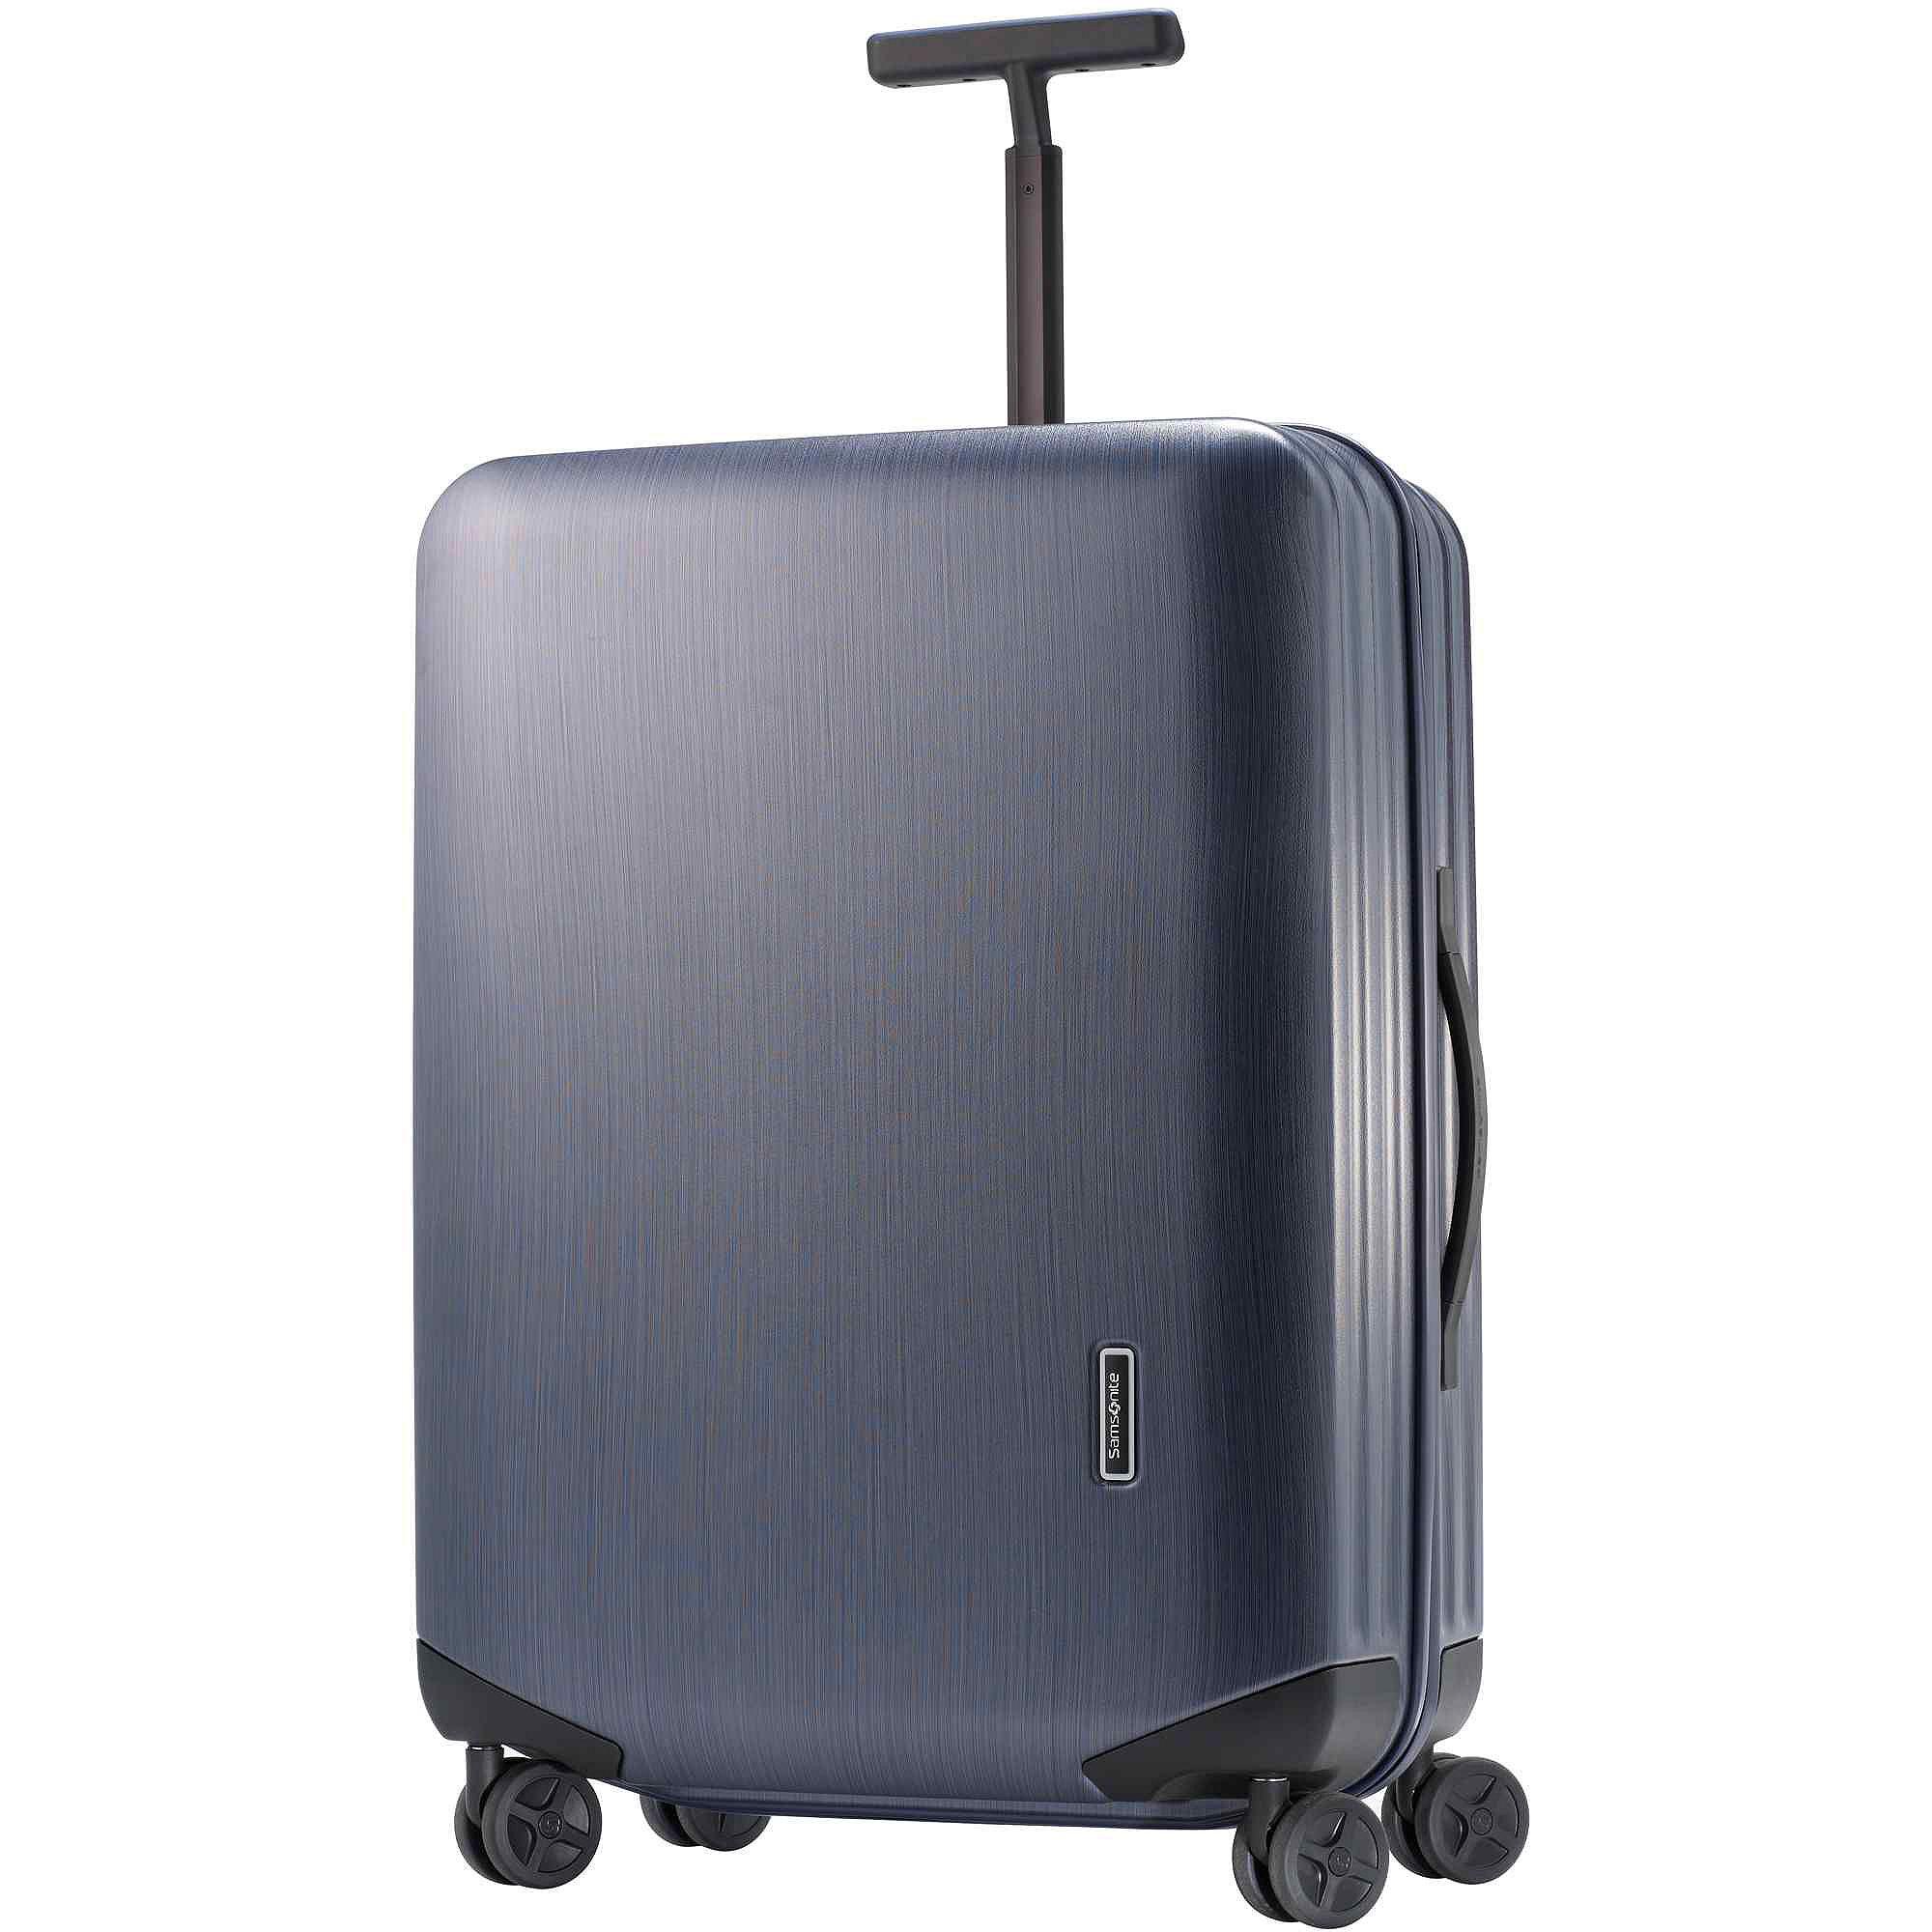 "Samsonite Inova 20"" Hardside Carry-On Upright Luggage"